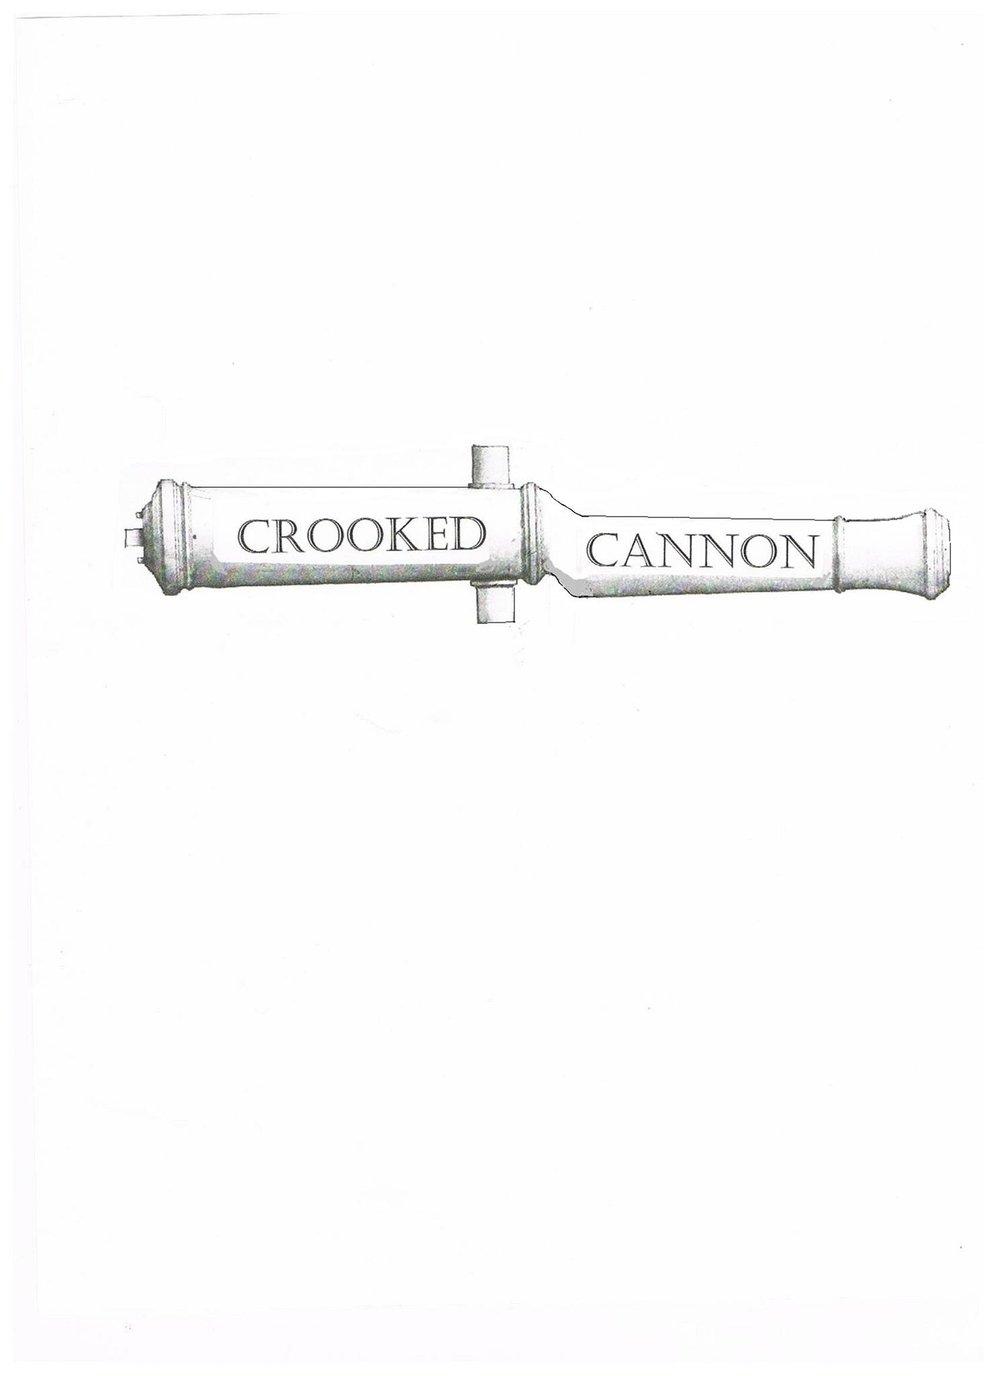 crookedcannon.jpg